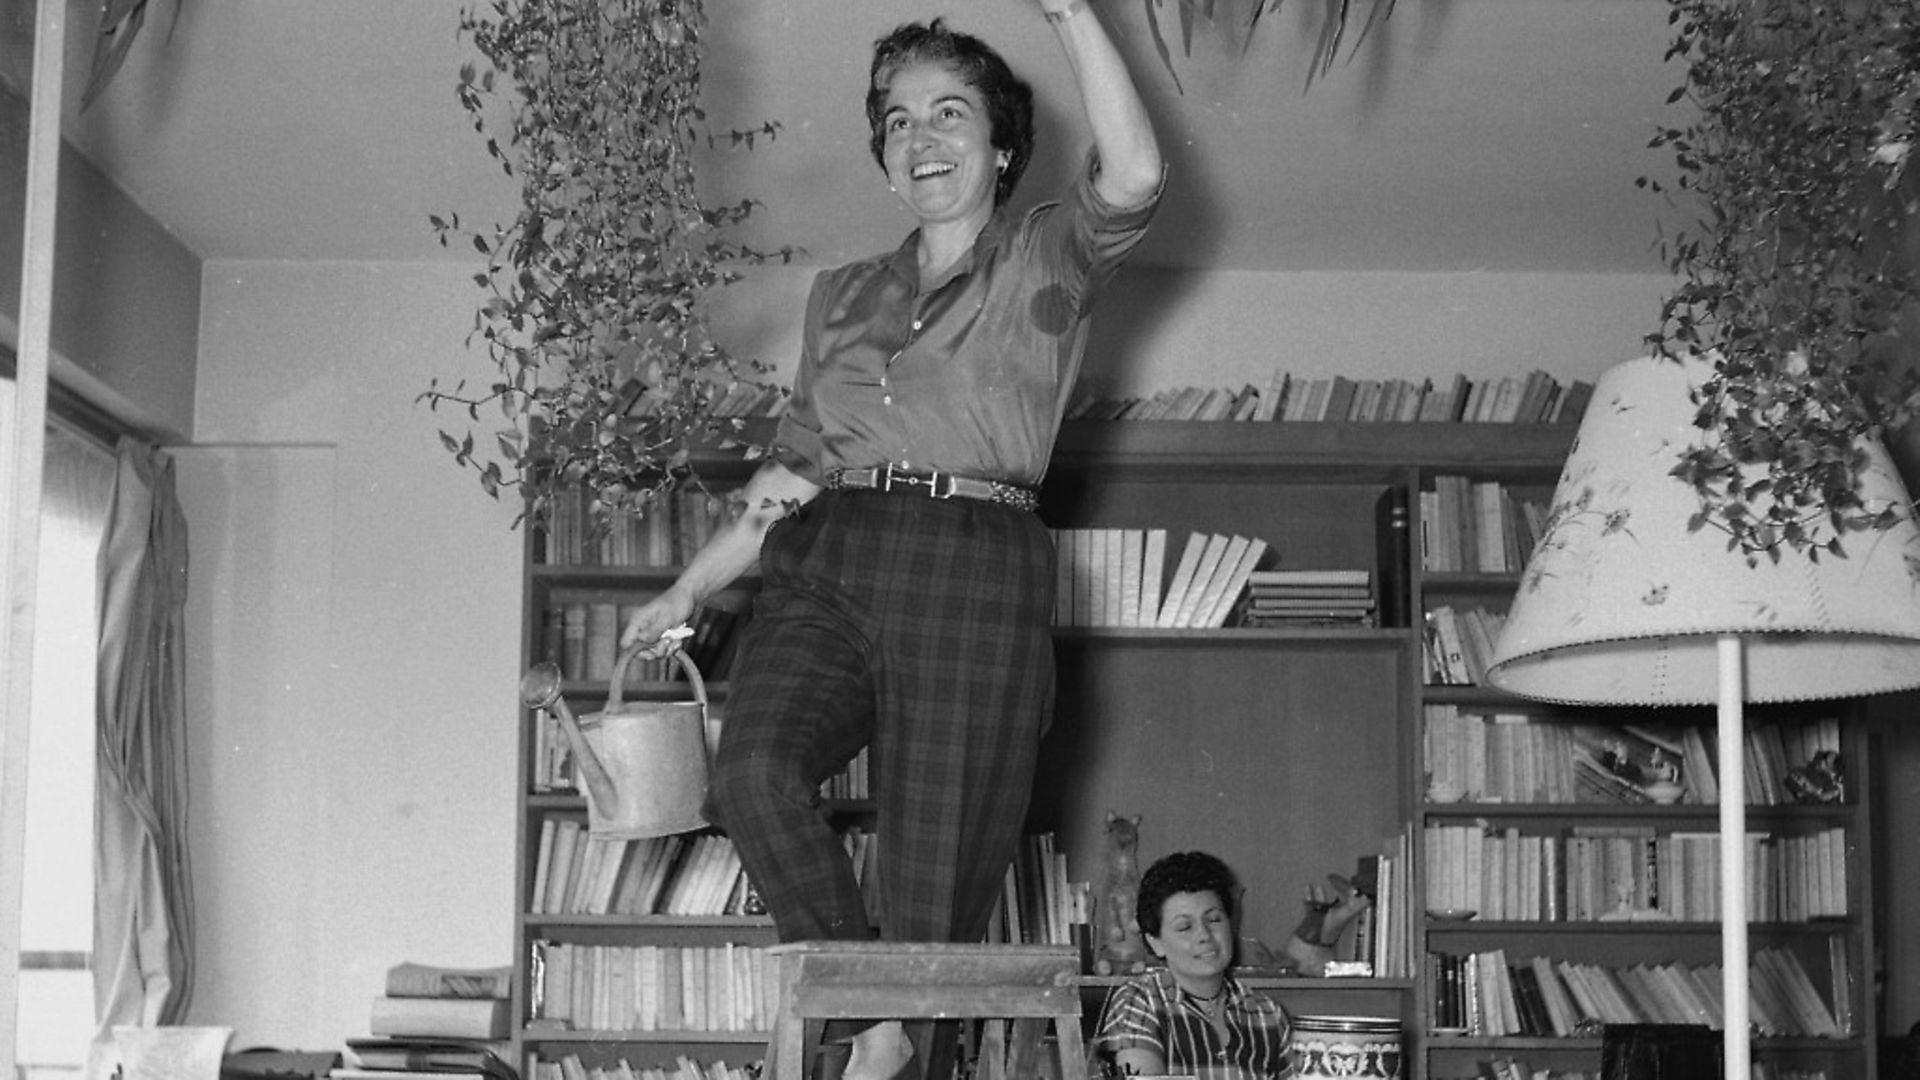 Jacqueline Audry (1908-1977), French film-maker in 1955. Photo: Gaston Paris - Credit: Roger Viollet via Getty Images